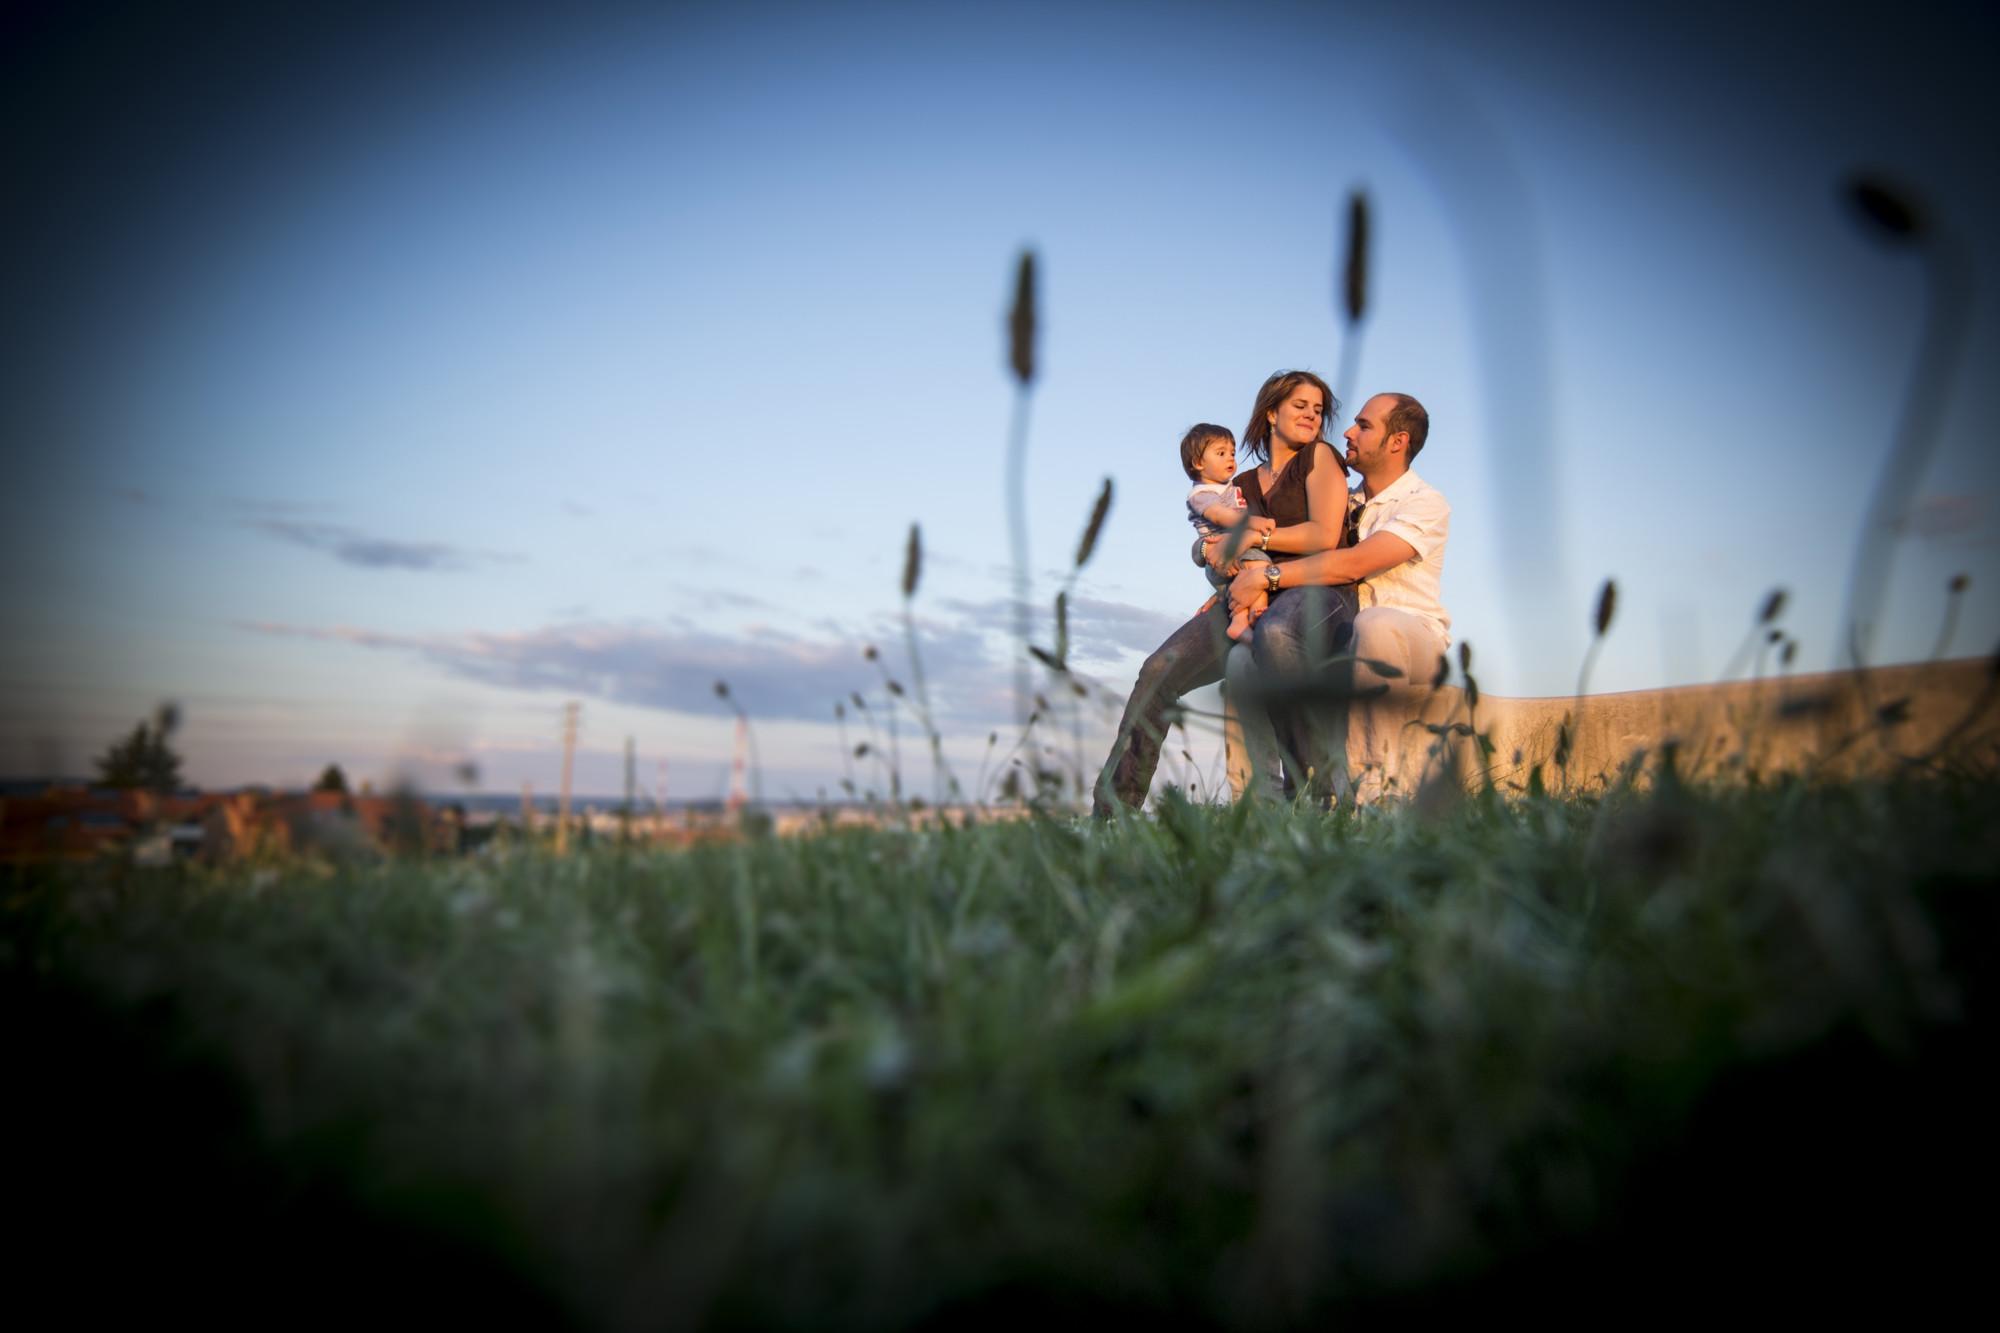 fotos de familia en la naturaleza